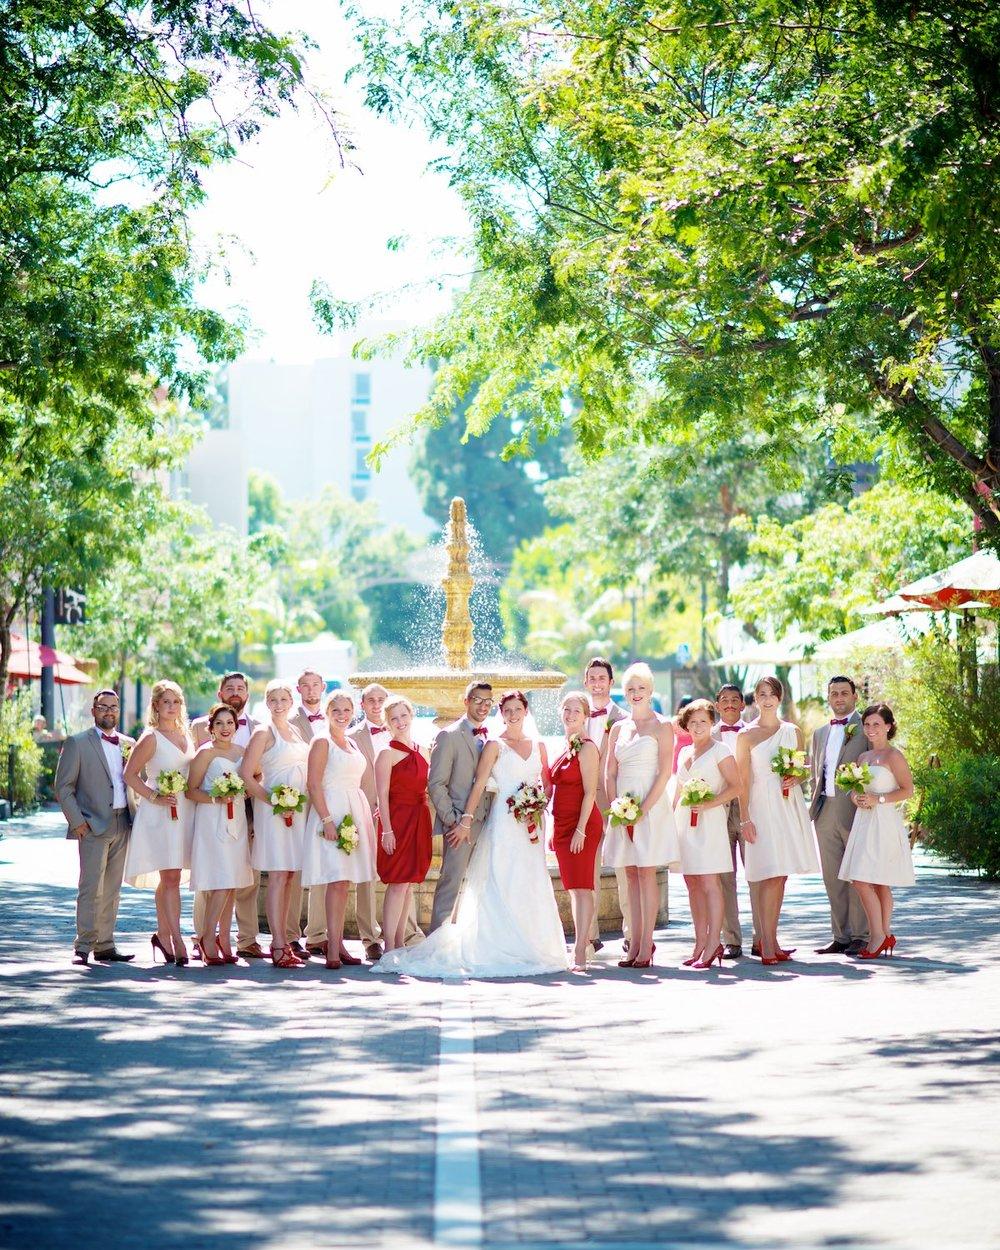 anta-ana-wedding-michal-pfeil-26.jpg